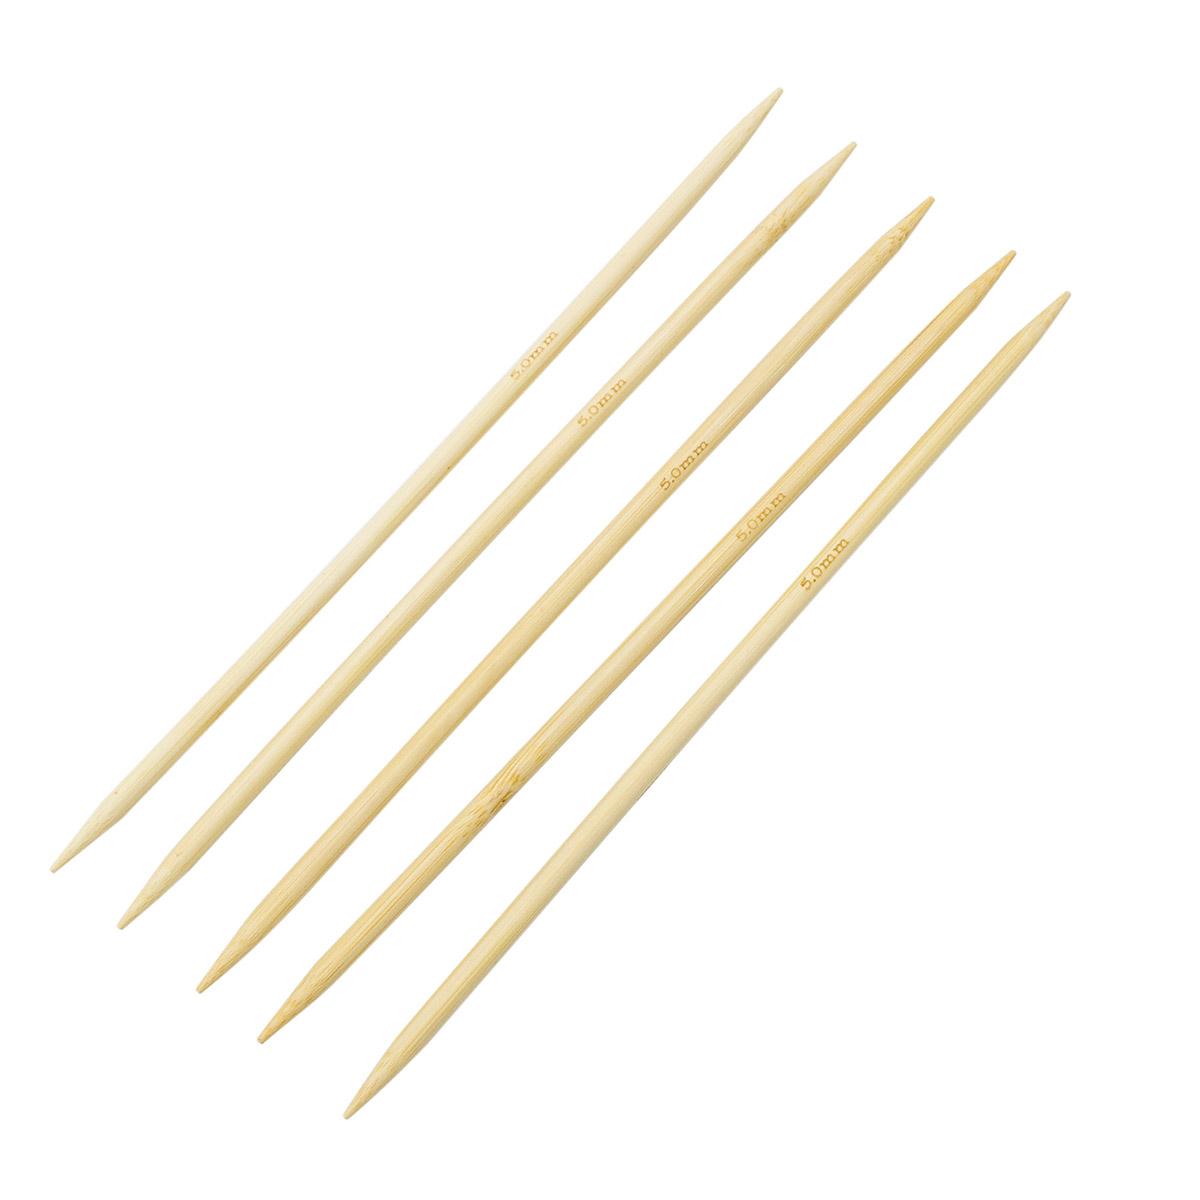 Спицы носочные бамбук 942550, 20 см, 5,0 мм, Hobby&Pro